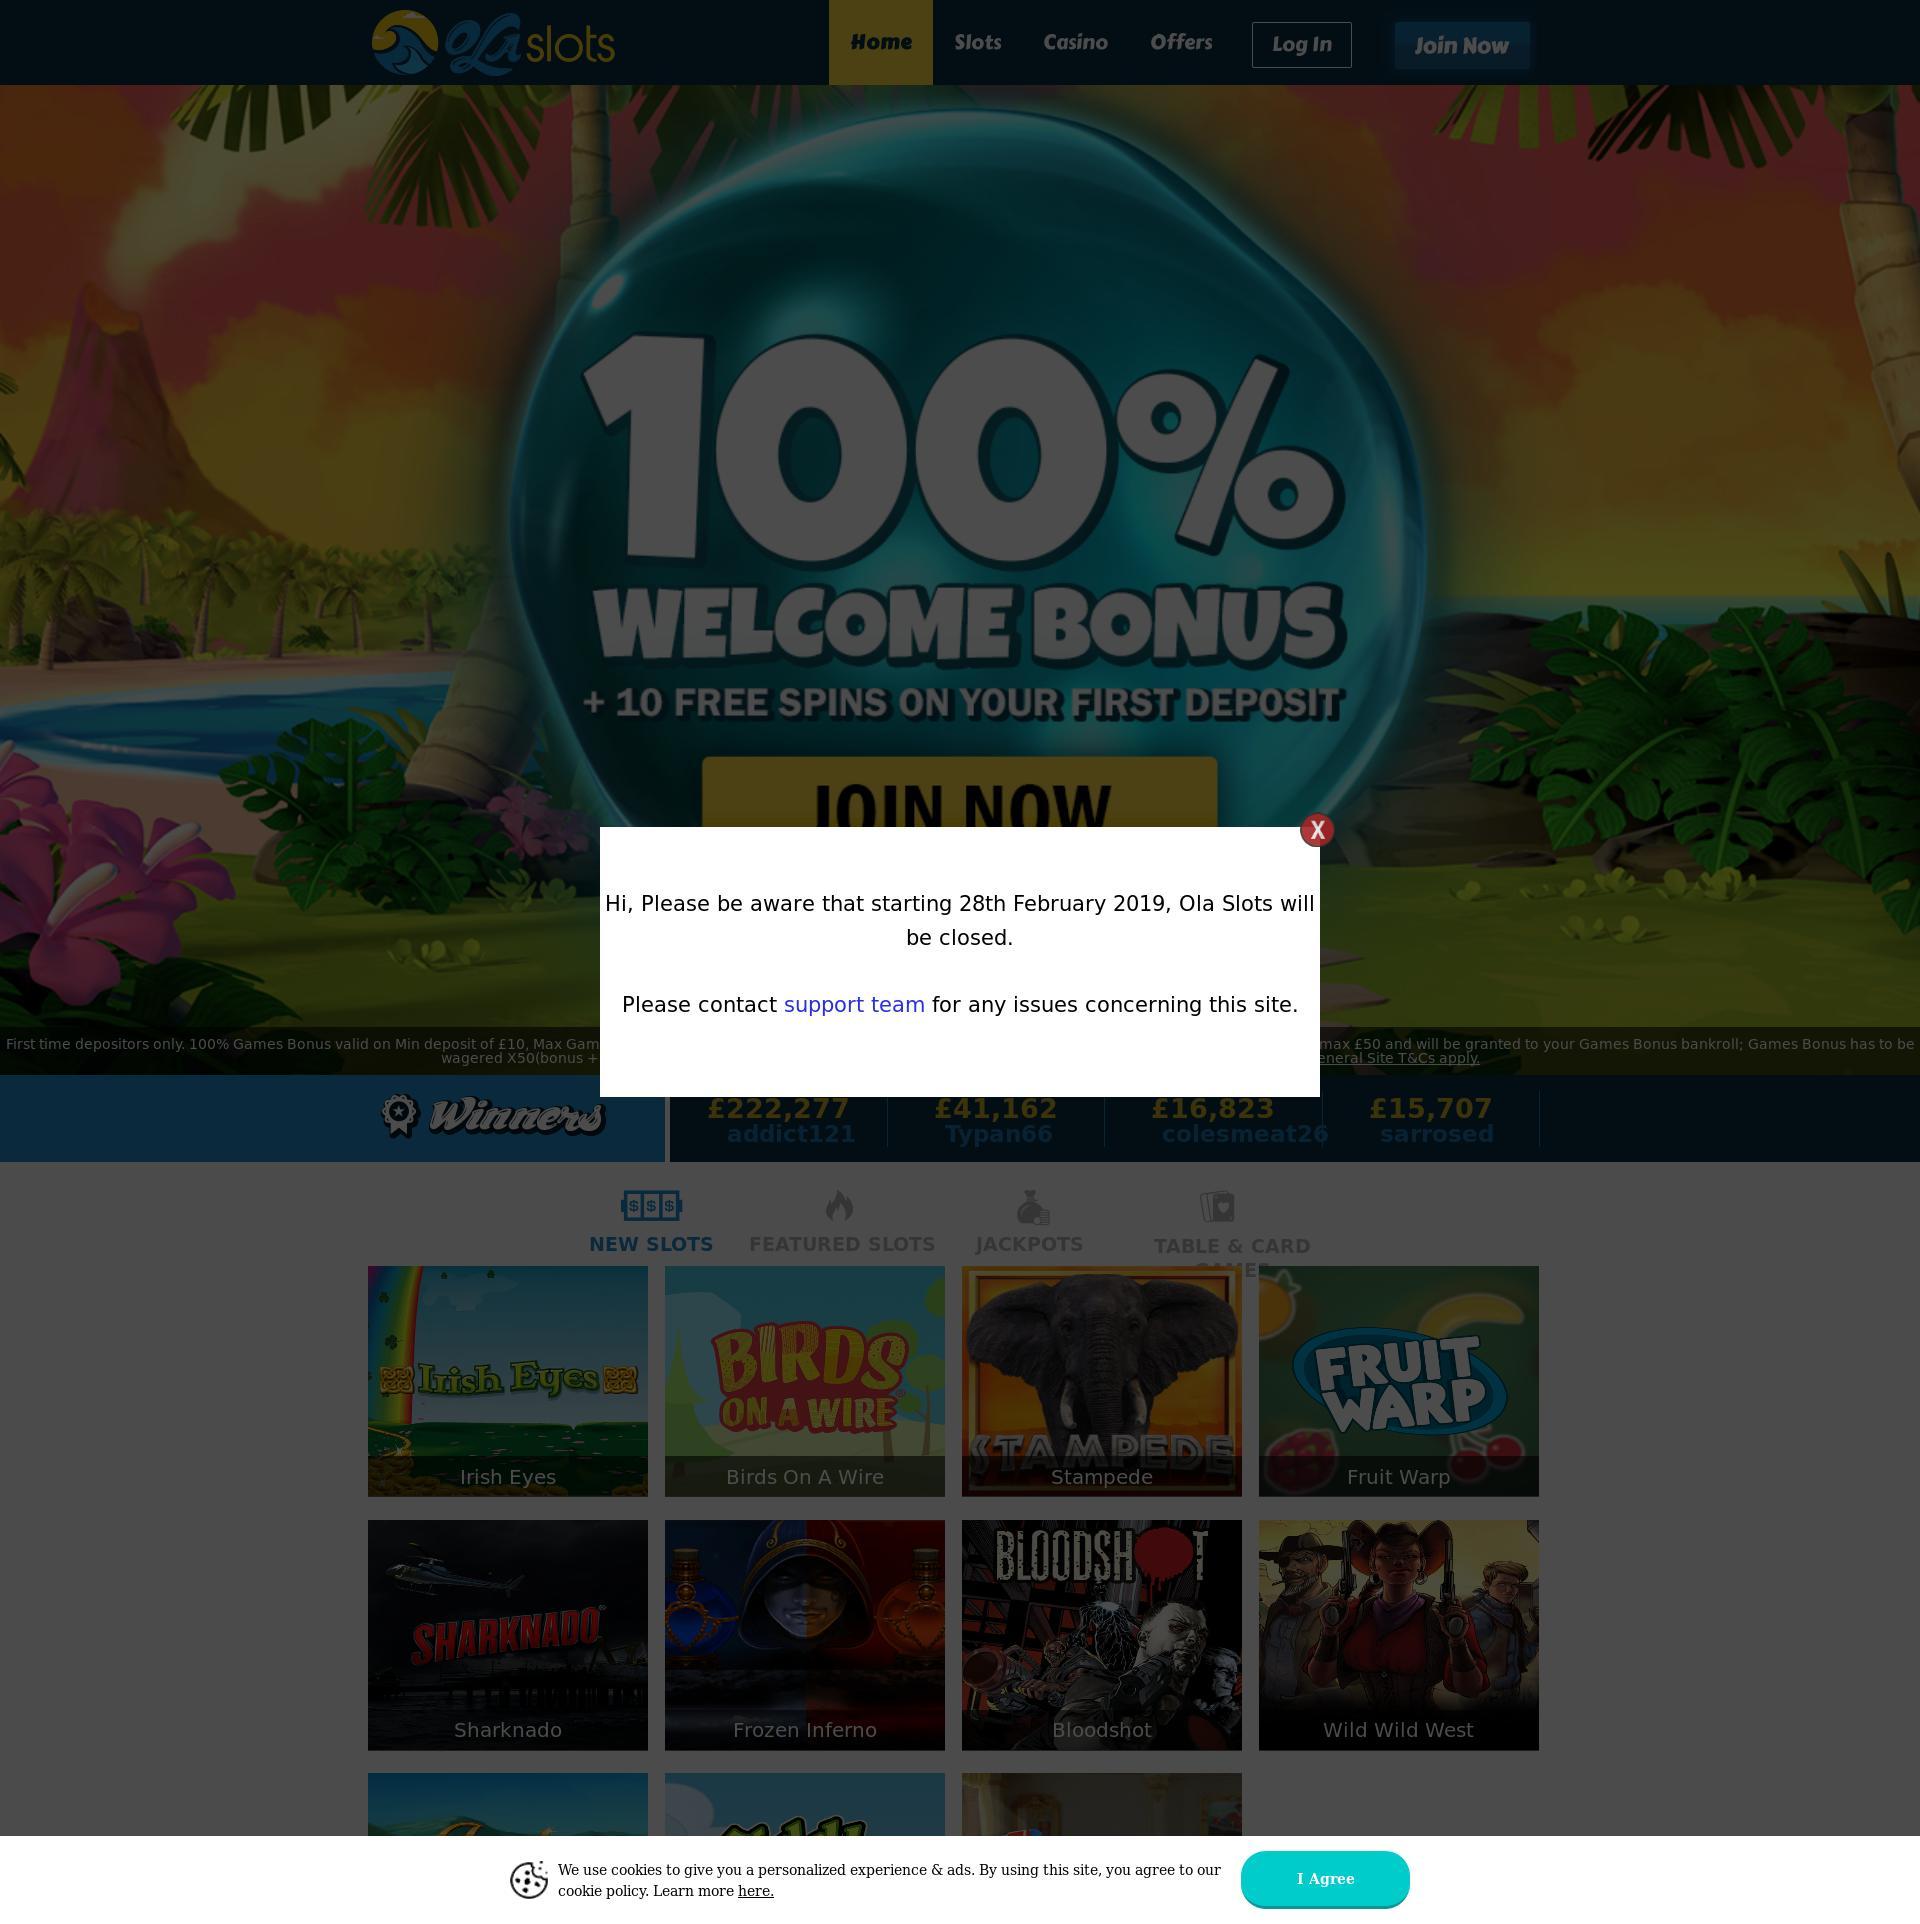 Casino screen Lobby 2019-02-28 for United Kingdom